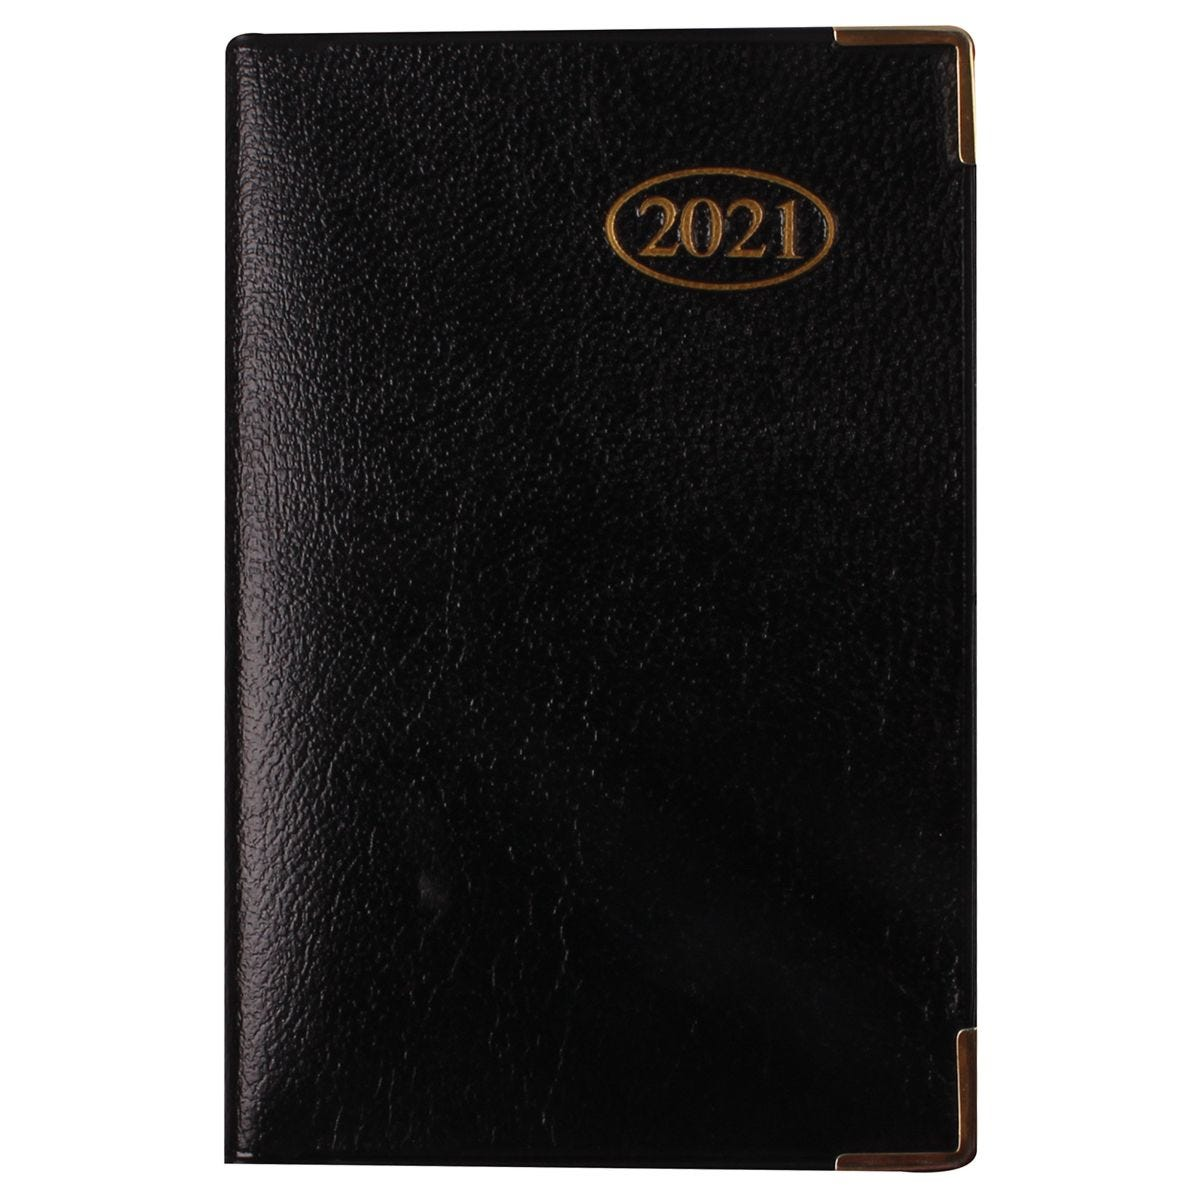 Ryman Executive Pocket Diary Week to View 2021 - Black